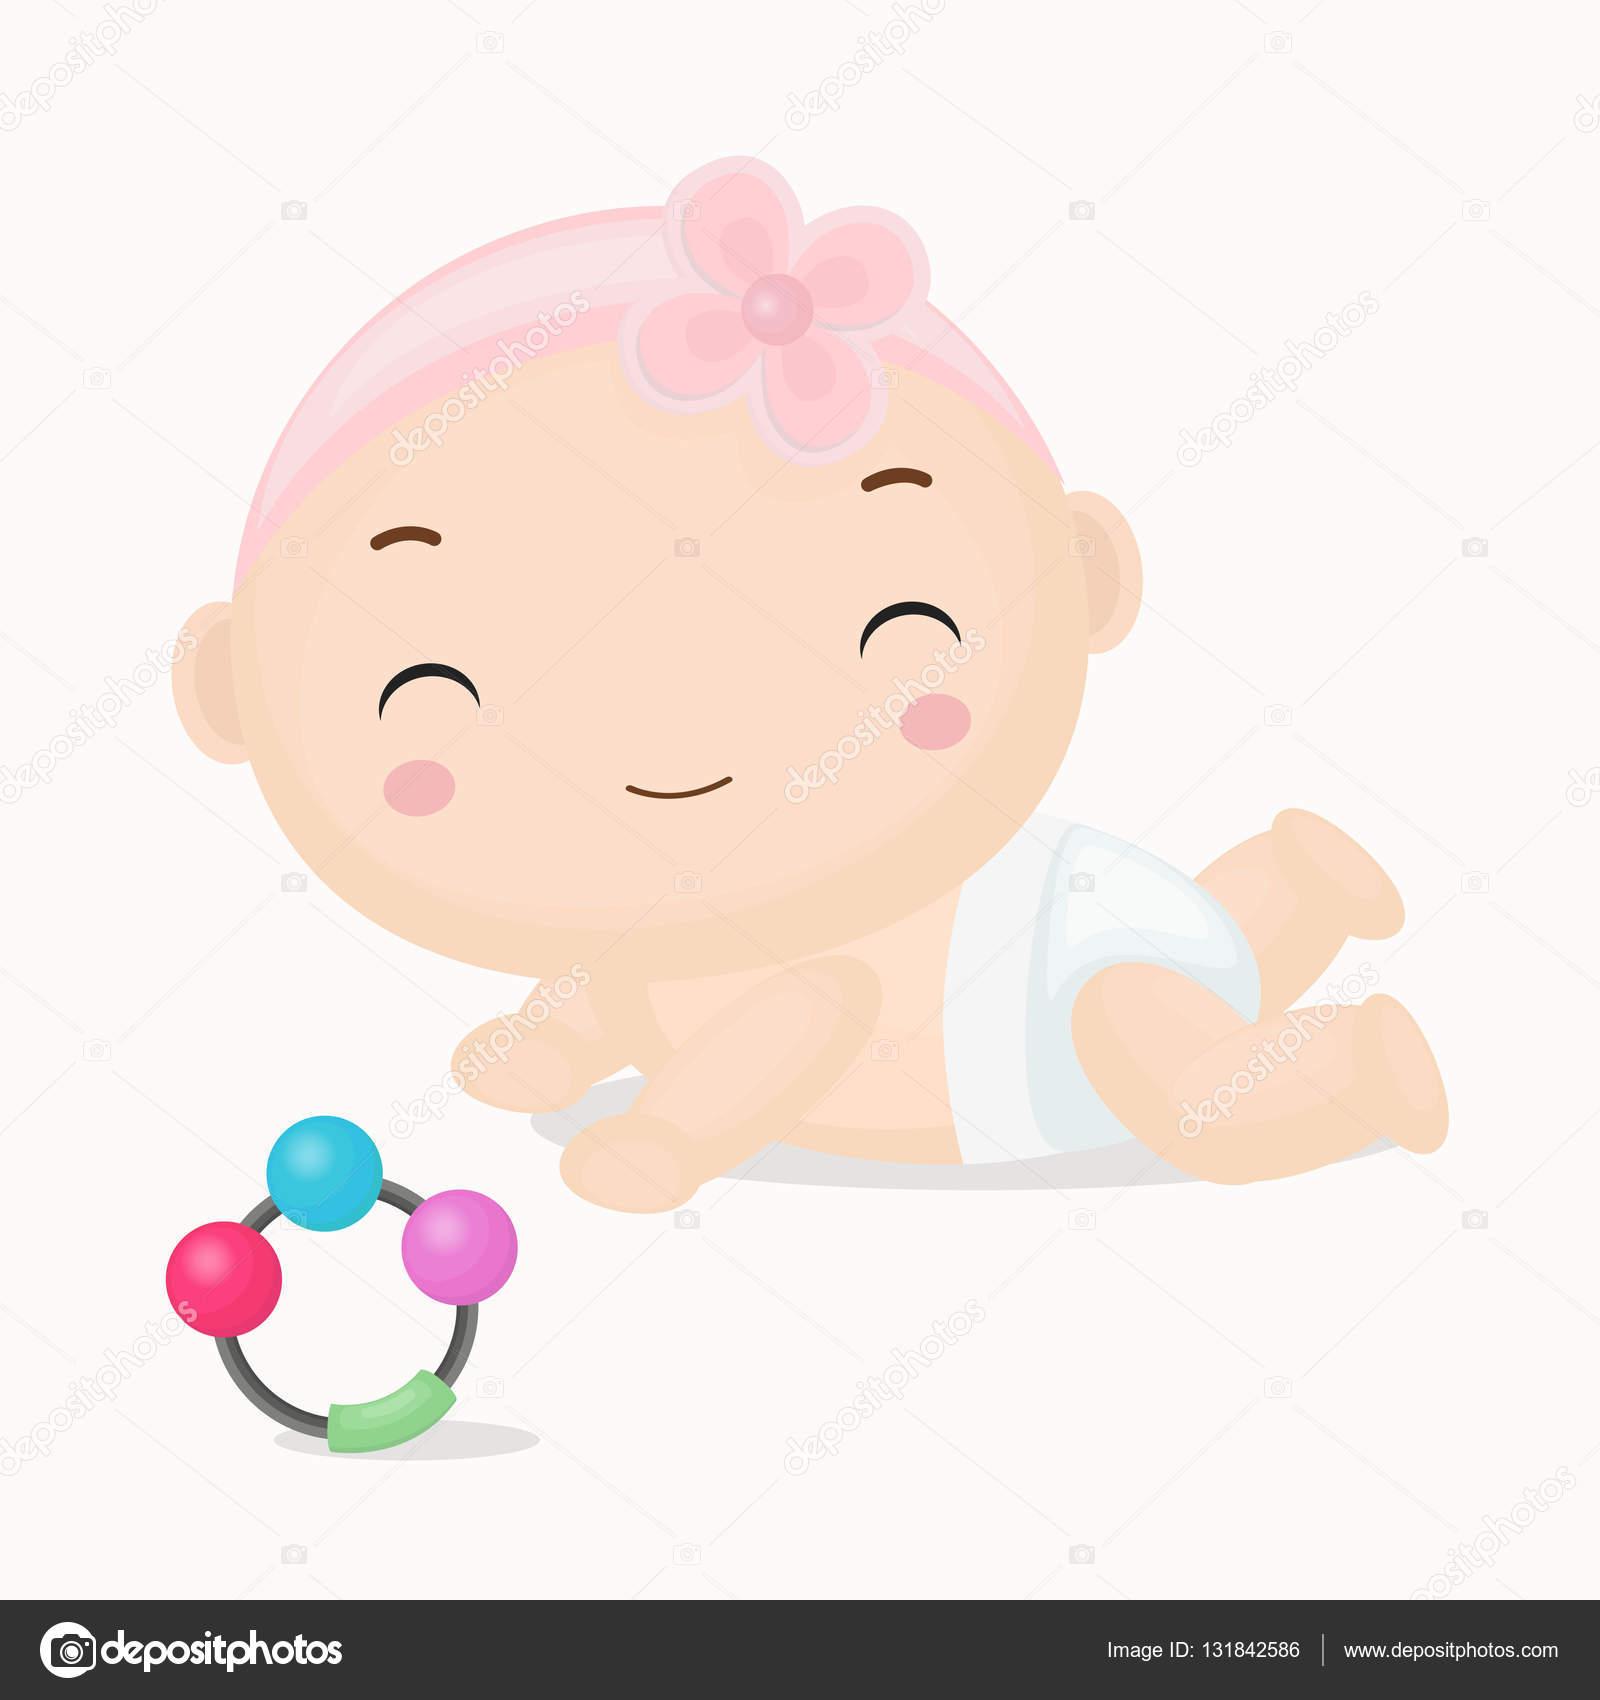 dessin anim mignon b b fille avec bandeaux rose dessin anim image vectorielle desyaghadhia. Black Bedroom Furniture Sets. Home Design Ideas